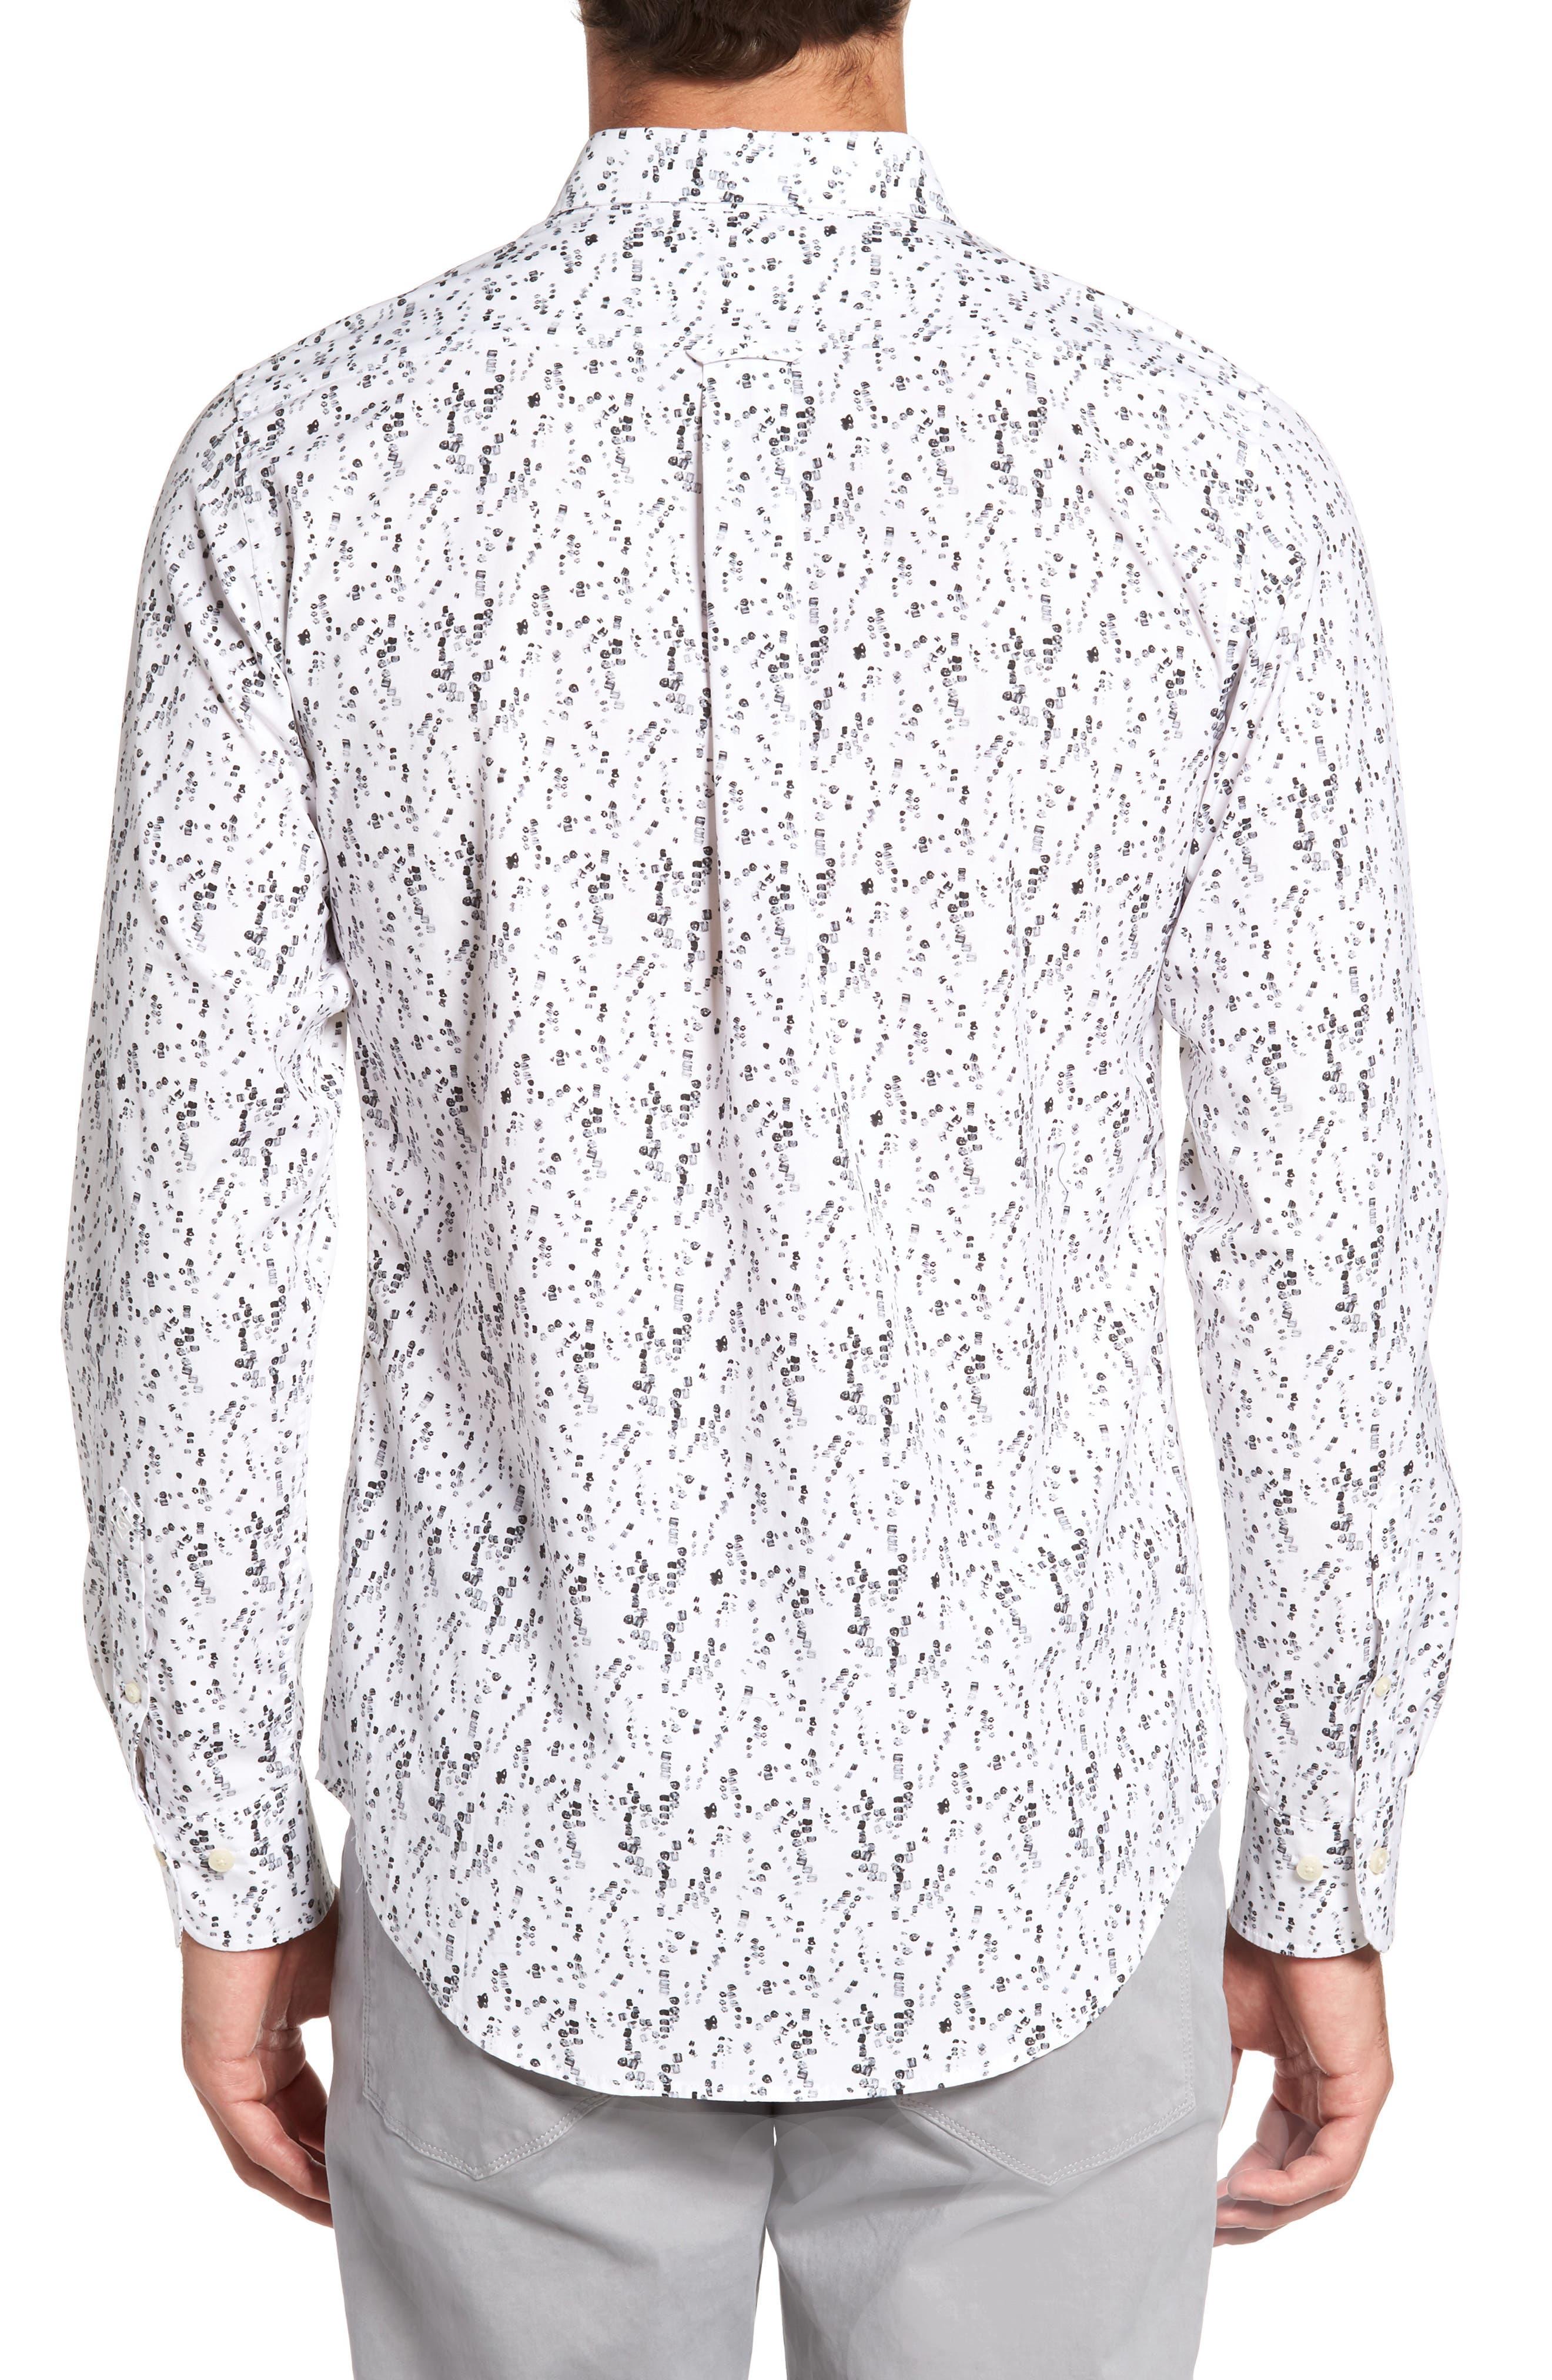 Alternate Image 2  - Gant Slim Fit Crushed Ice Print Sport Shirt